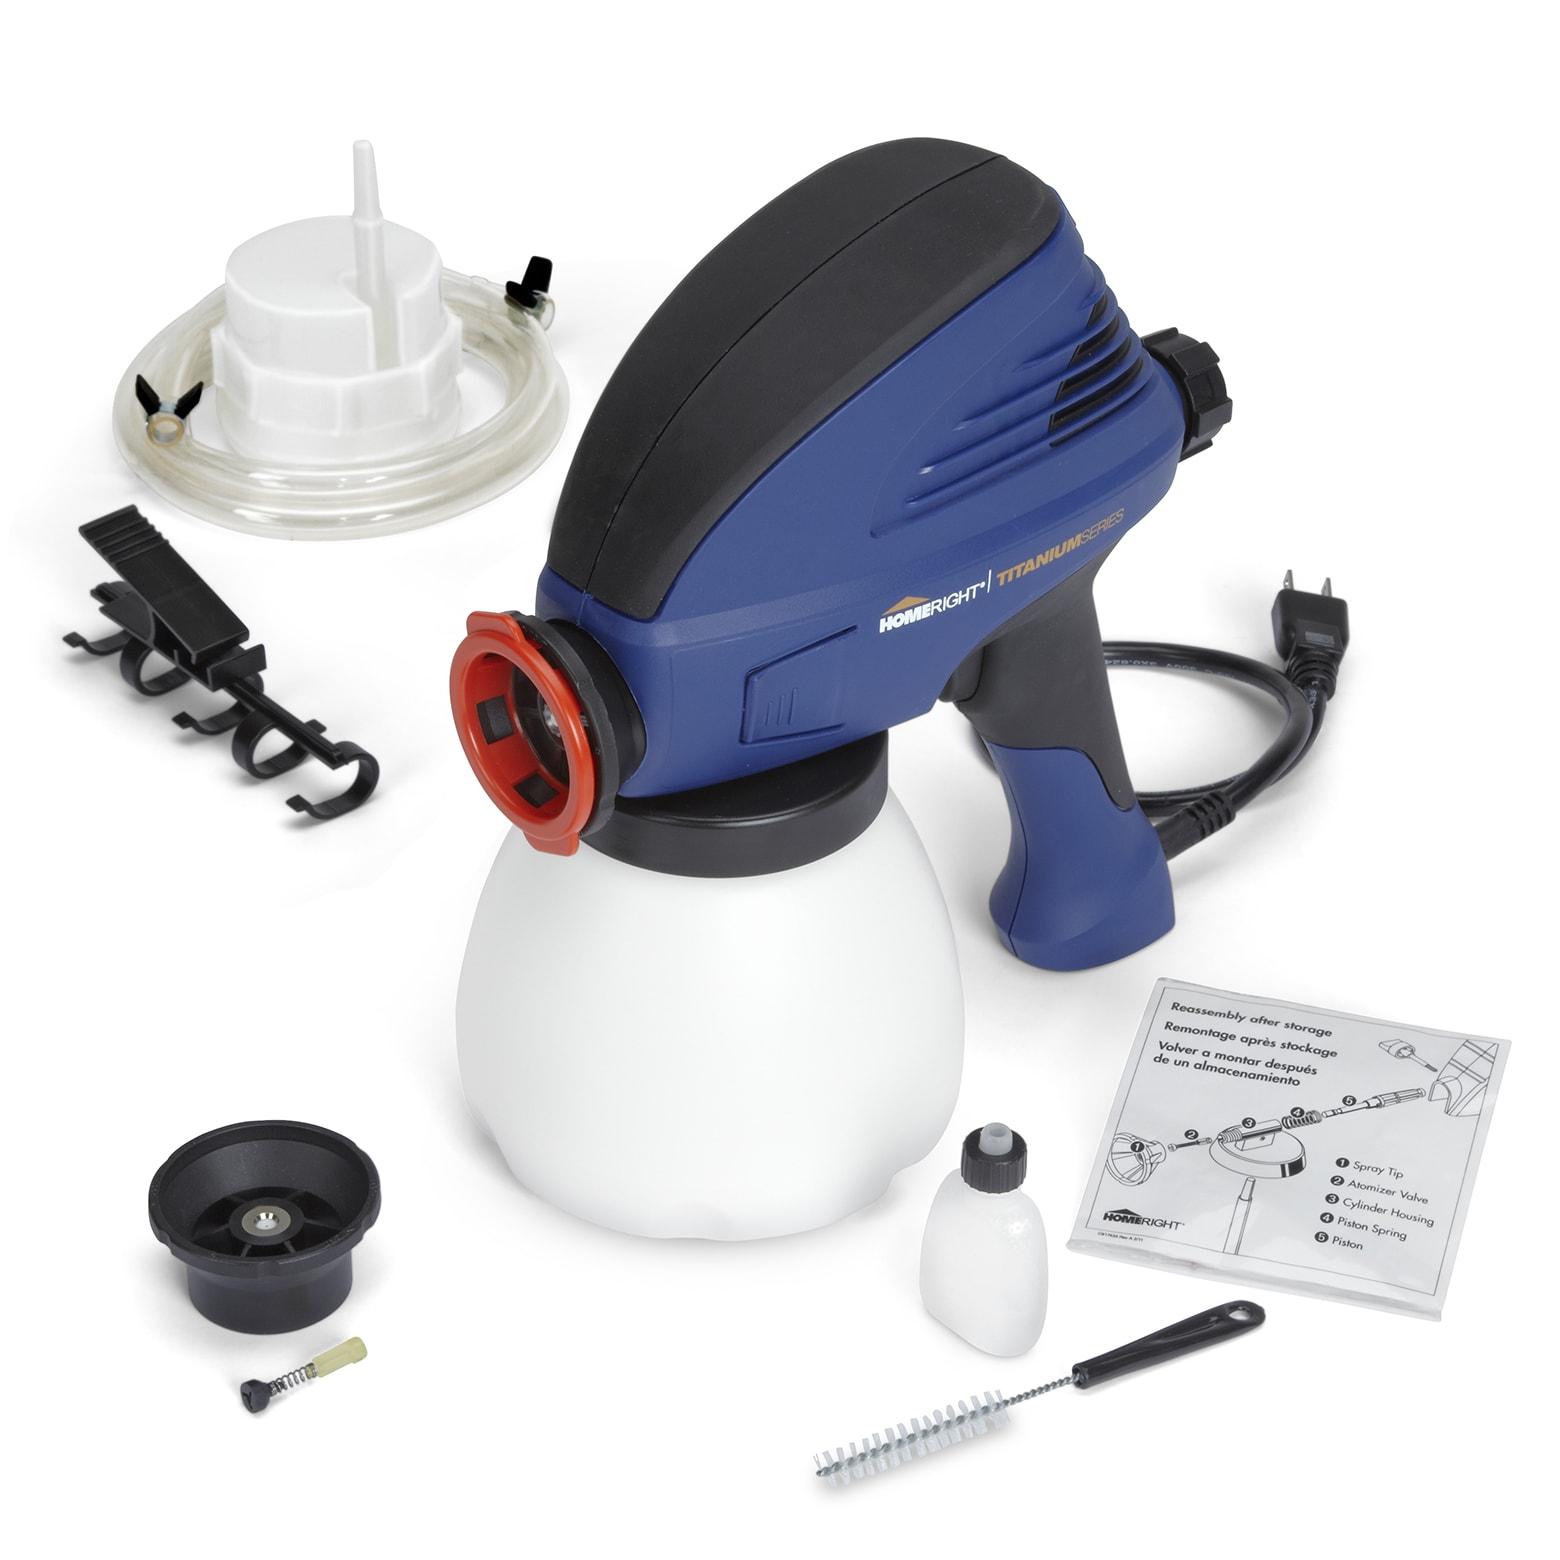 Home Right C800916 Medium Duty Paint Sprayer (Power Spray...